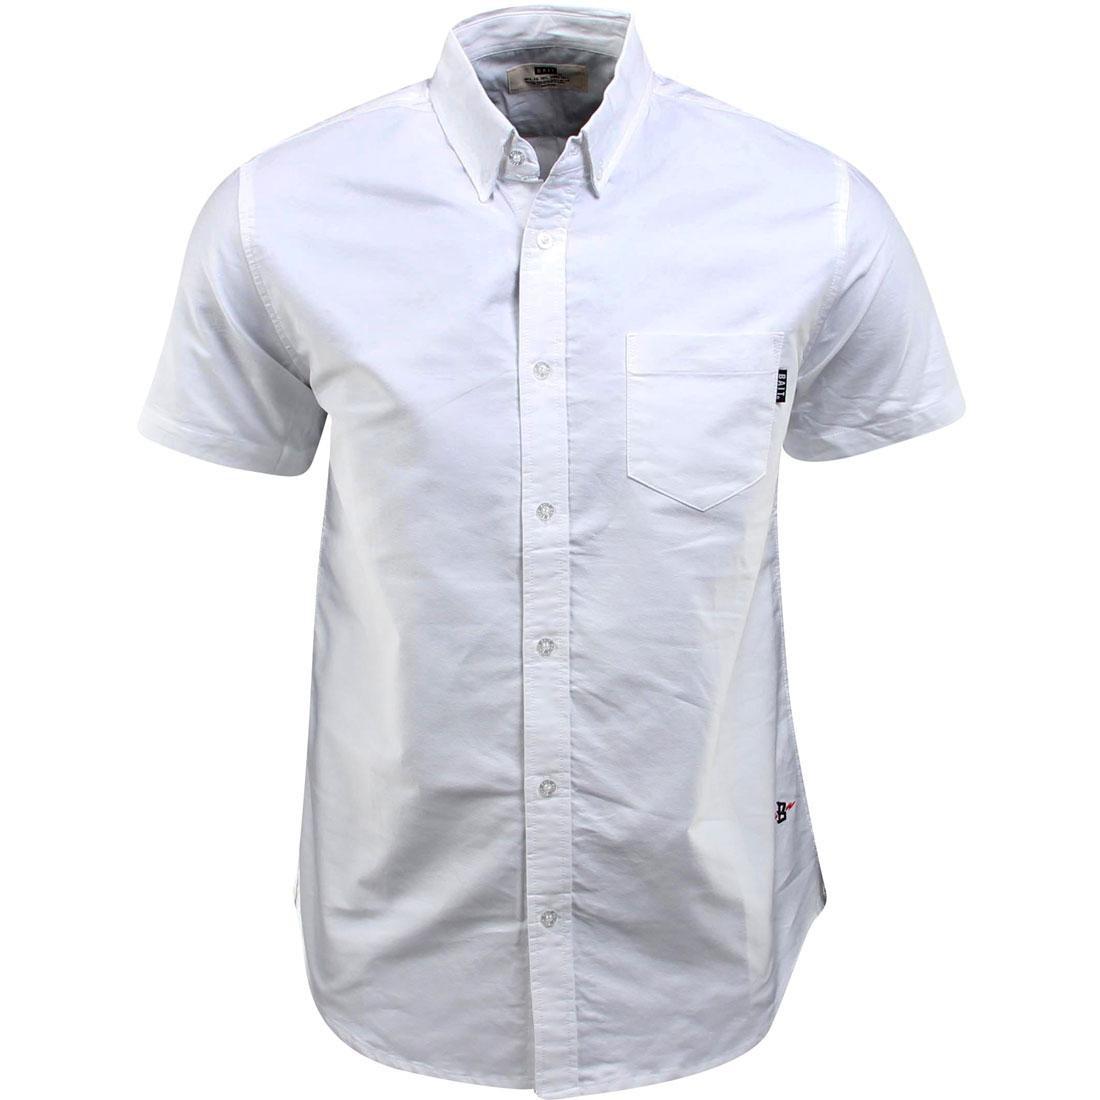 BAIT Oxford Short Sleeve Shirt (white)